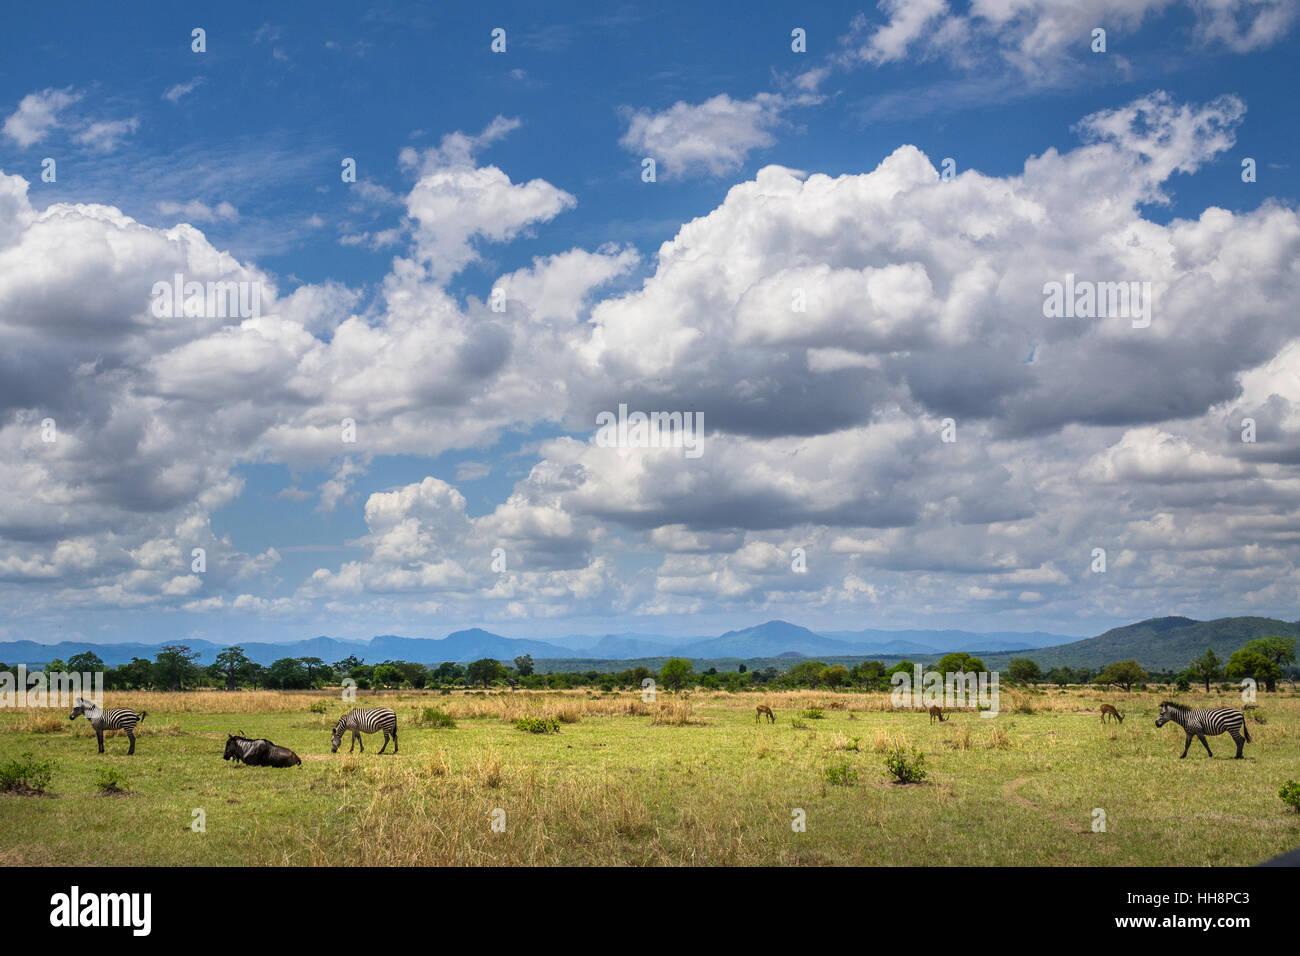 Afica wildlife animals free on thei home, Ruaha, Tanzania Stock ...